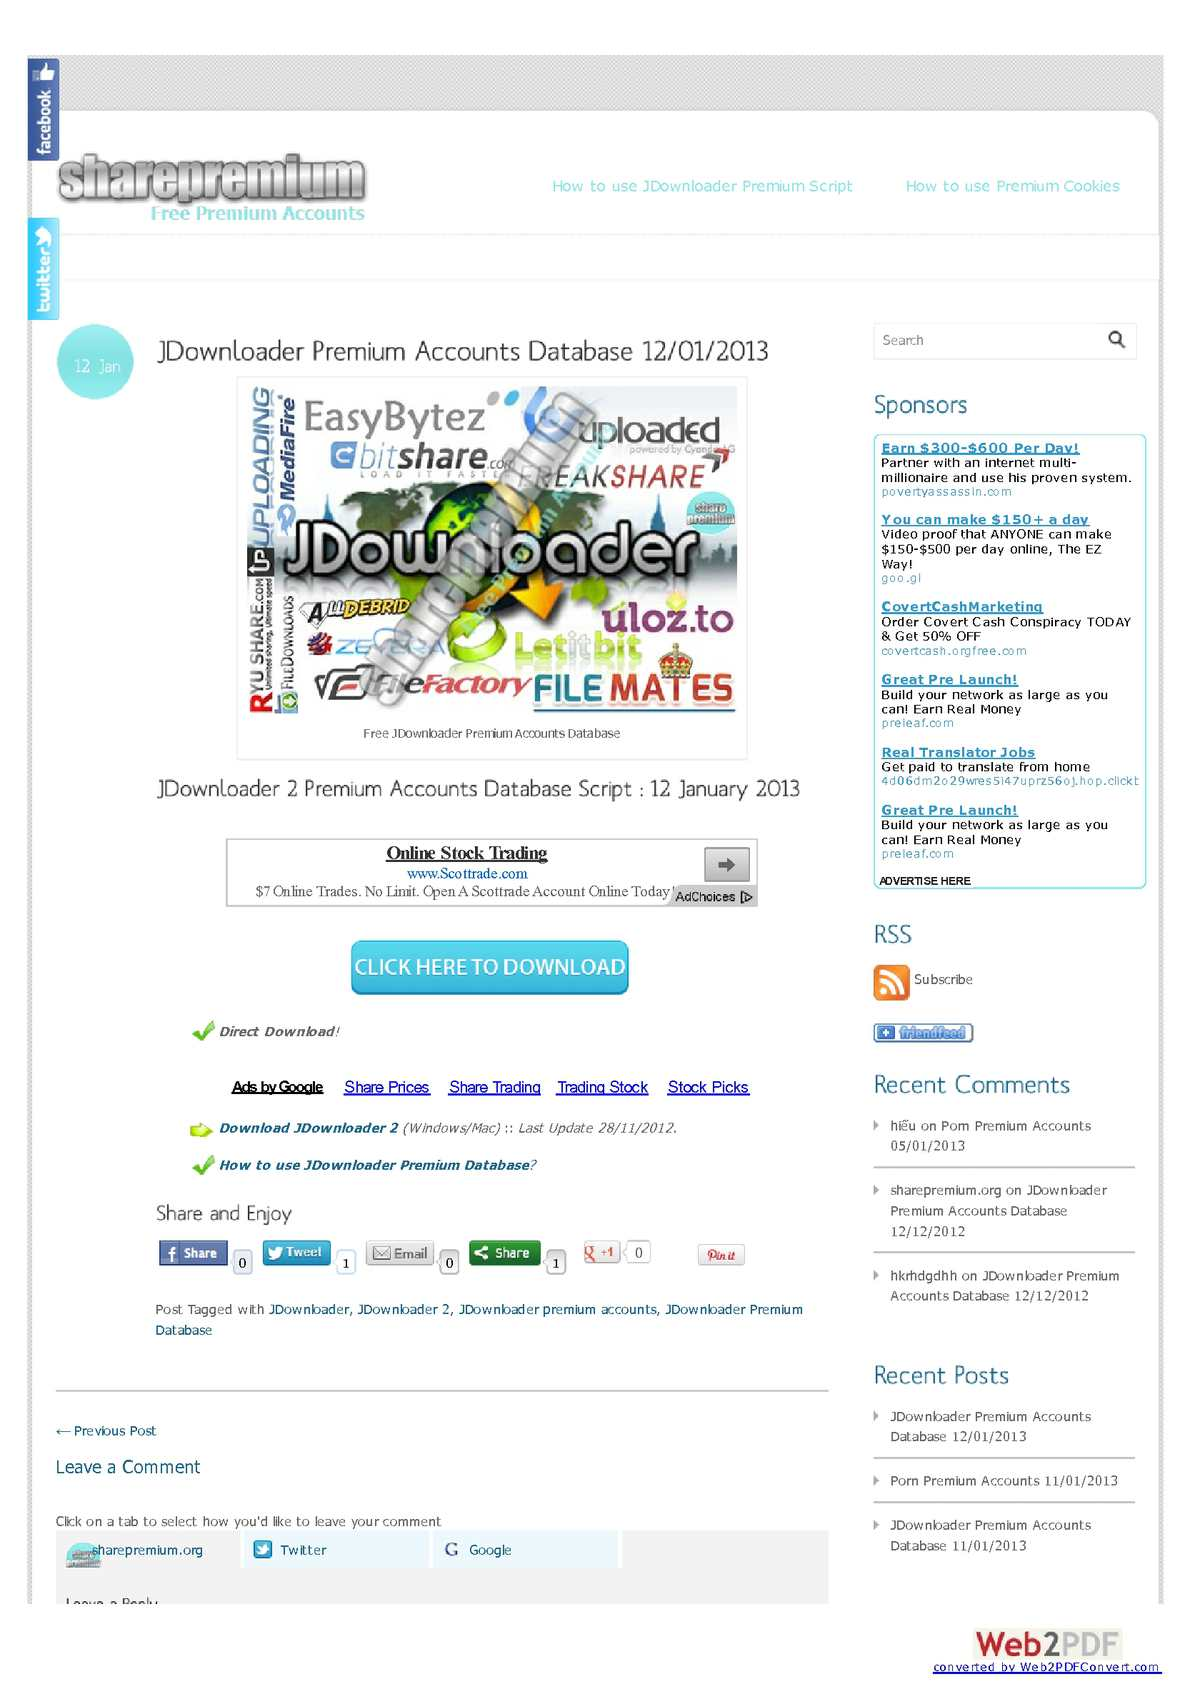 Calaméo - JDownloader Premium Accounts Database 12012013